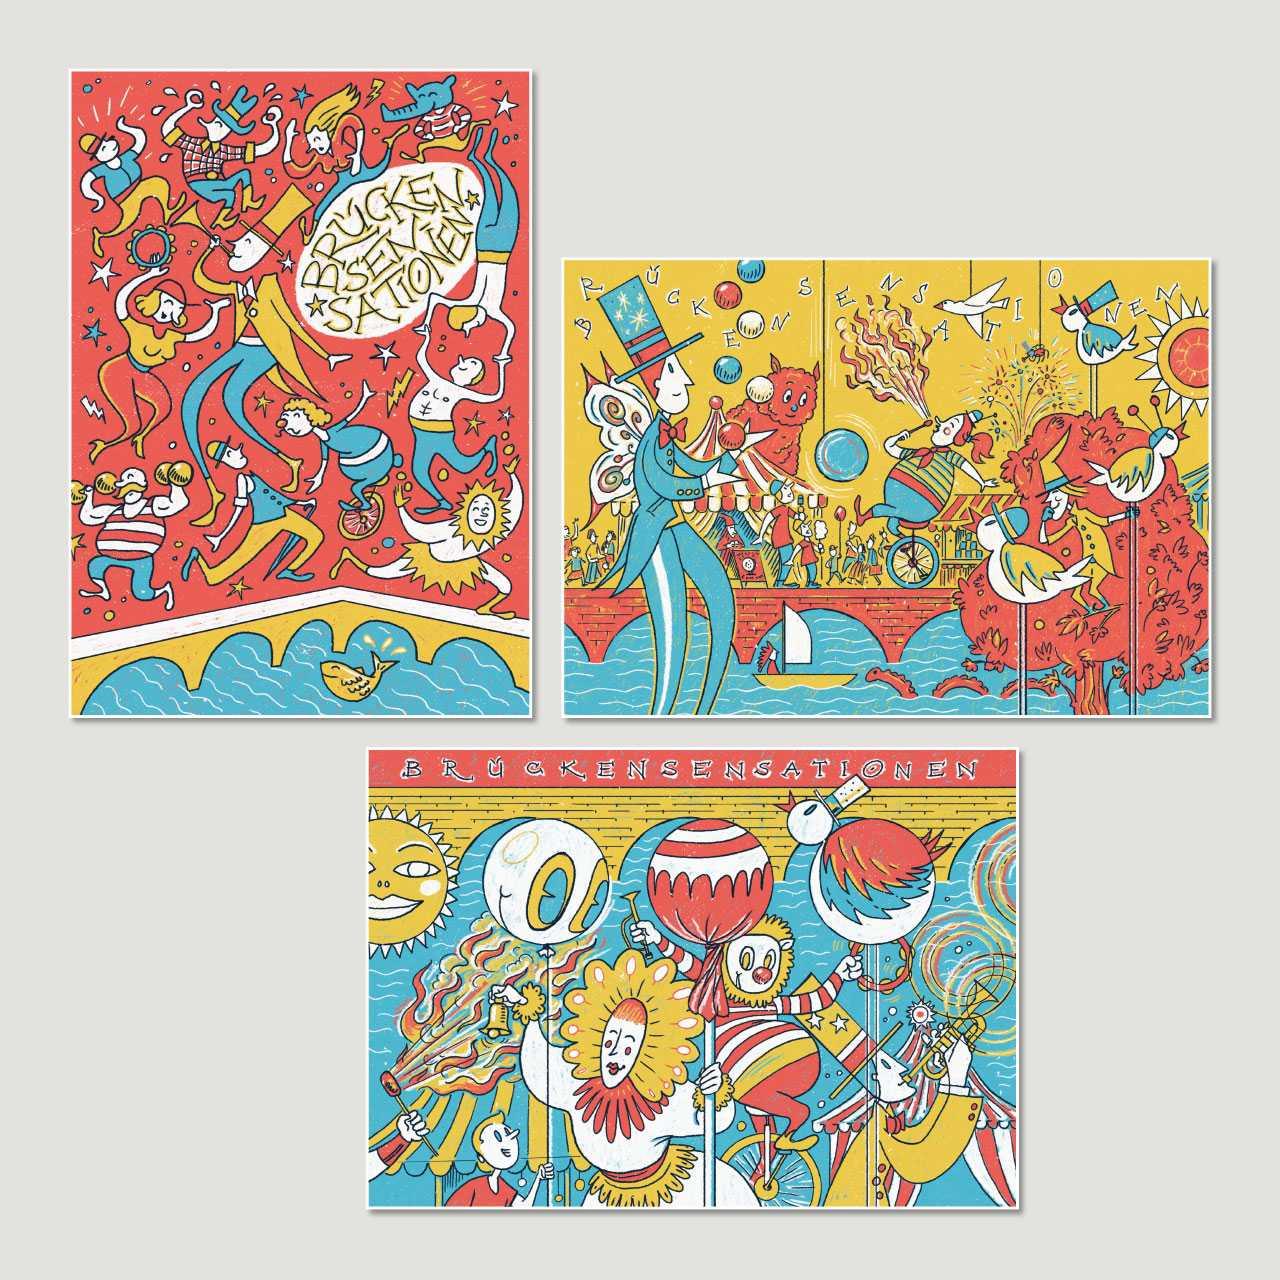 Kultur Rheinfelden: Postkarten «Brückensensationen»